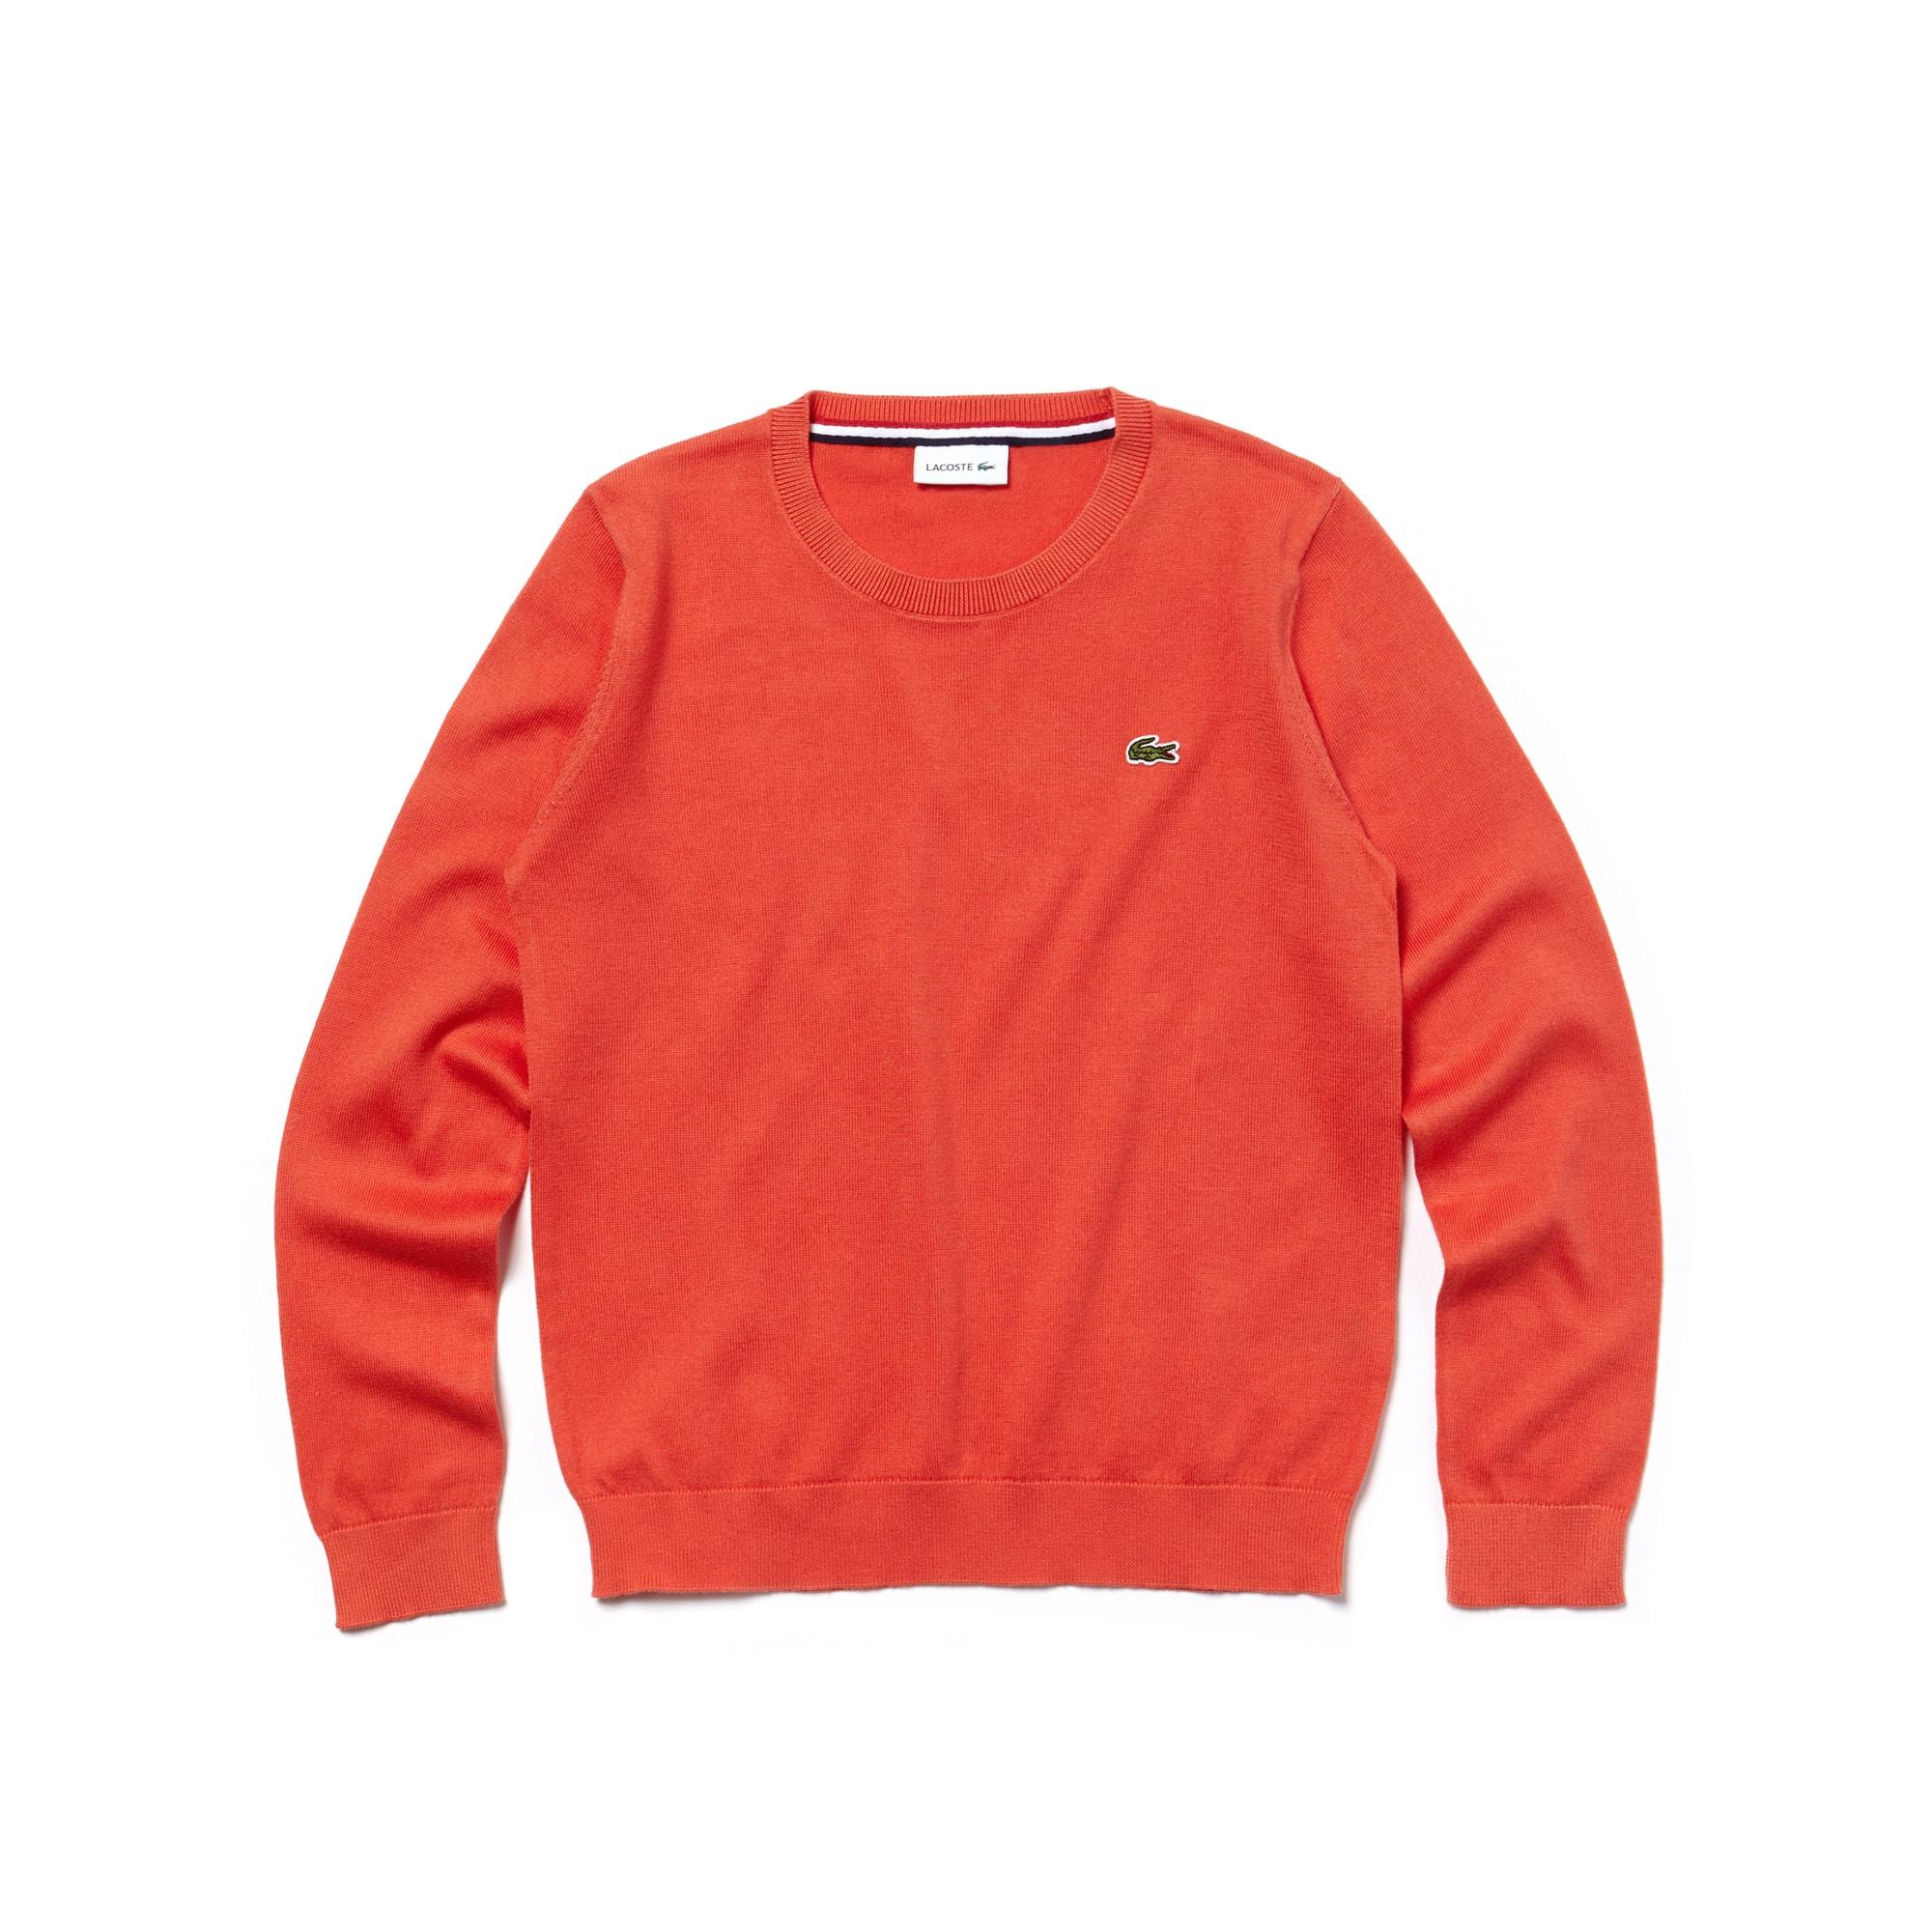 Boy's Crew Neck Cotton Jersey Sweater